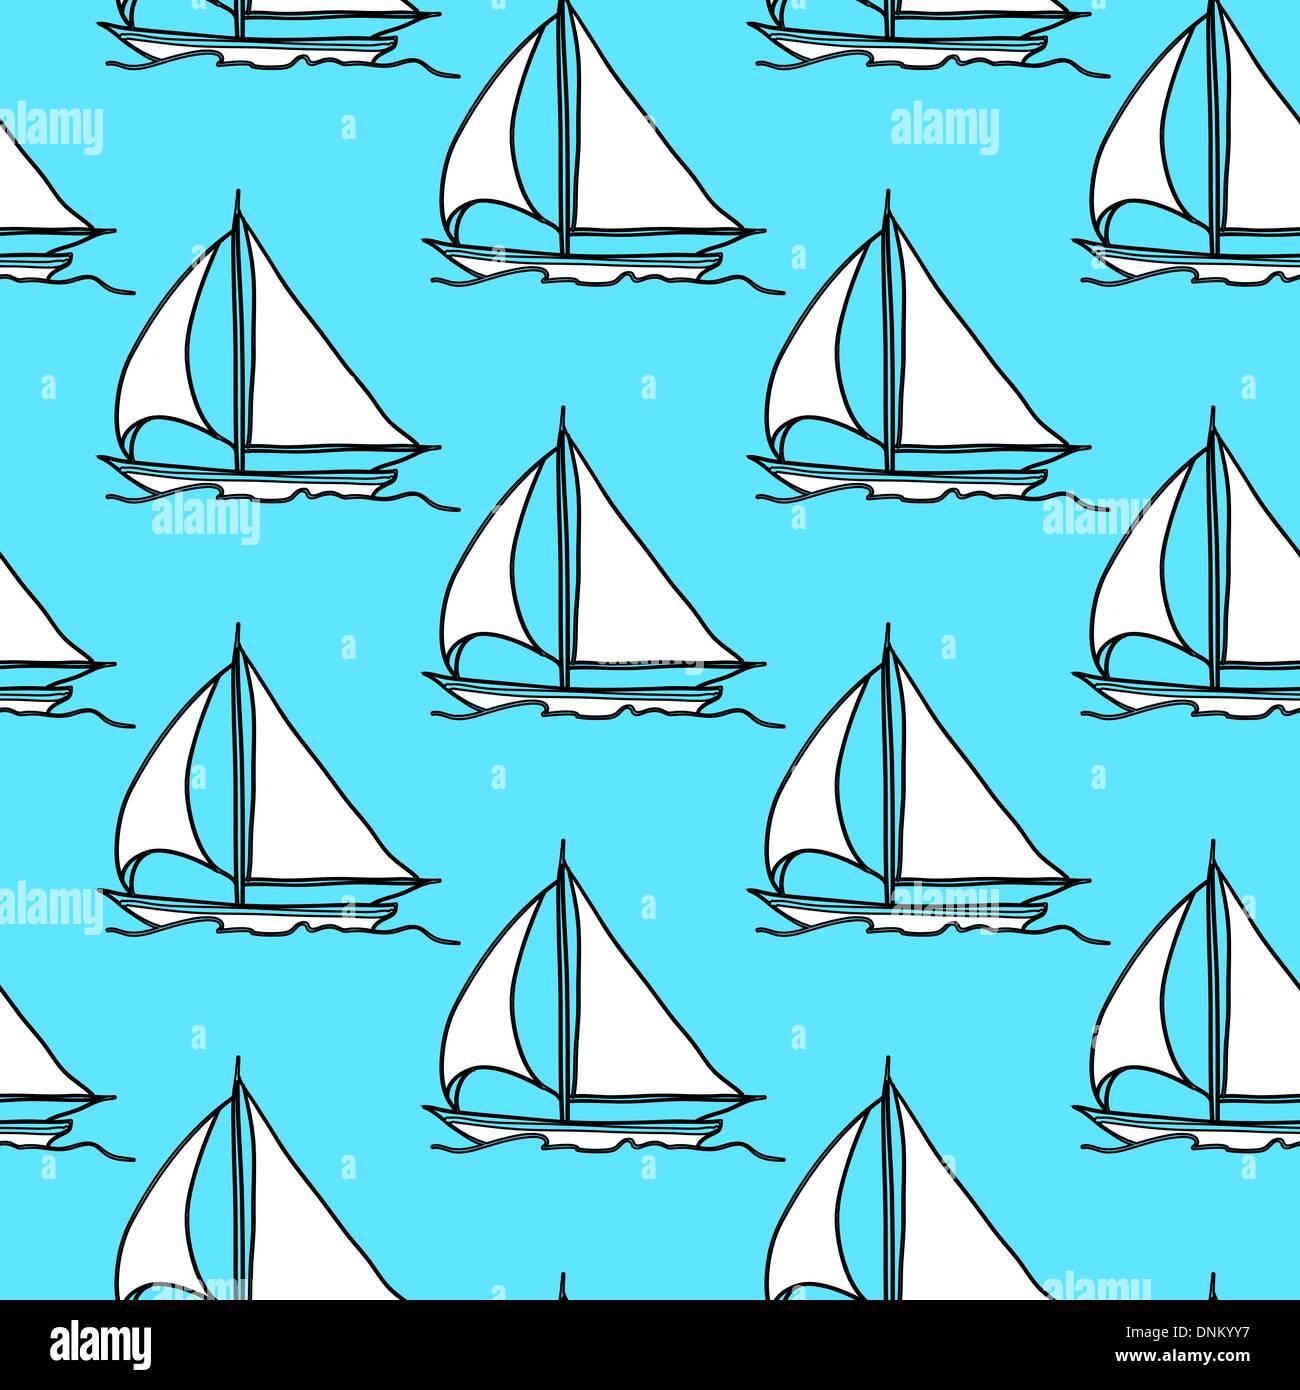 Papel tapiz perfecta con un velero en las olas Imagen De Stock